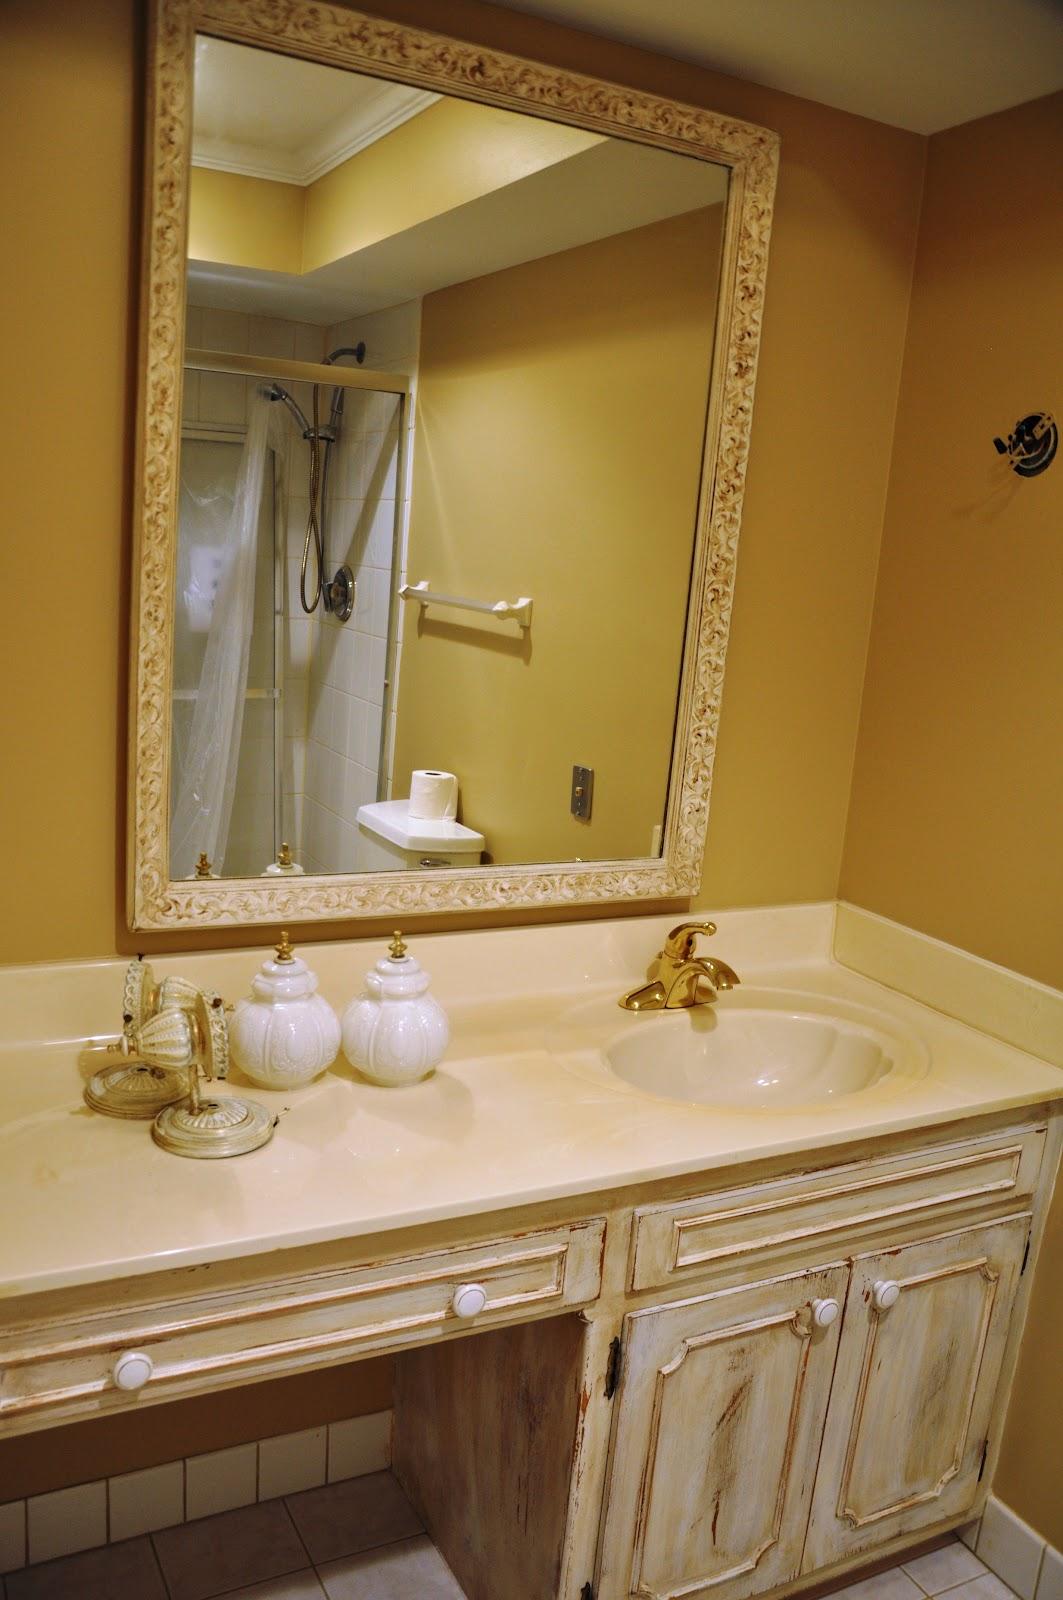 Serendipity Refined Blog Updating Bath Vanities Chalky Paint Recipe